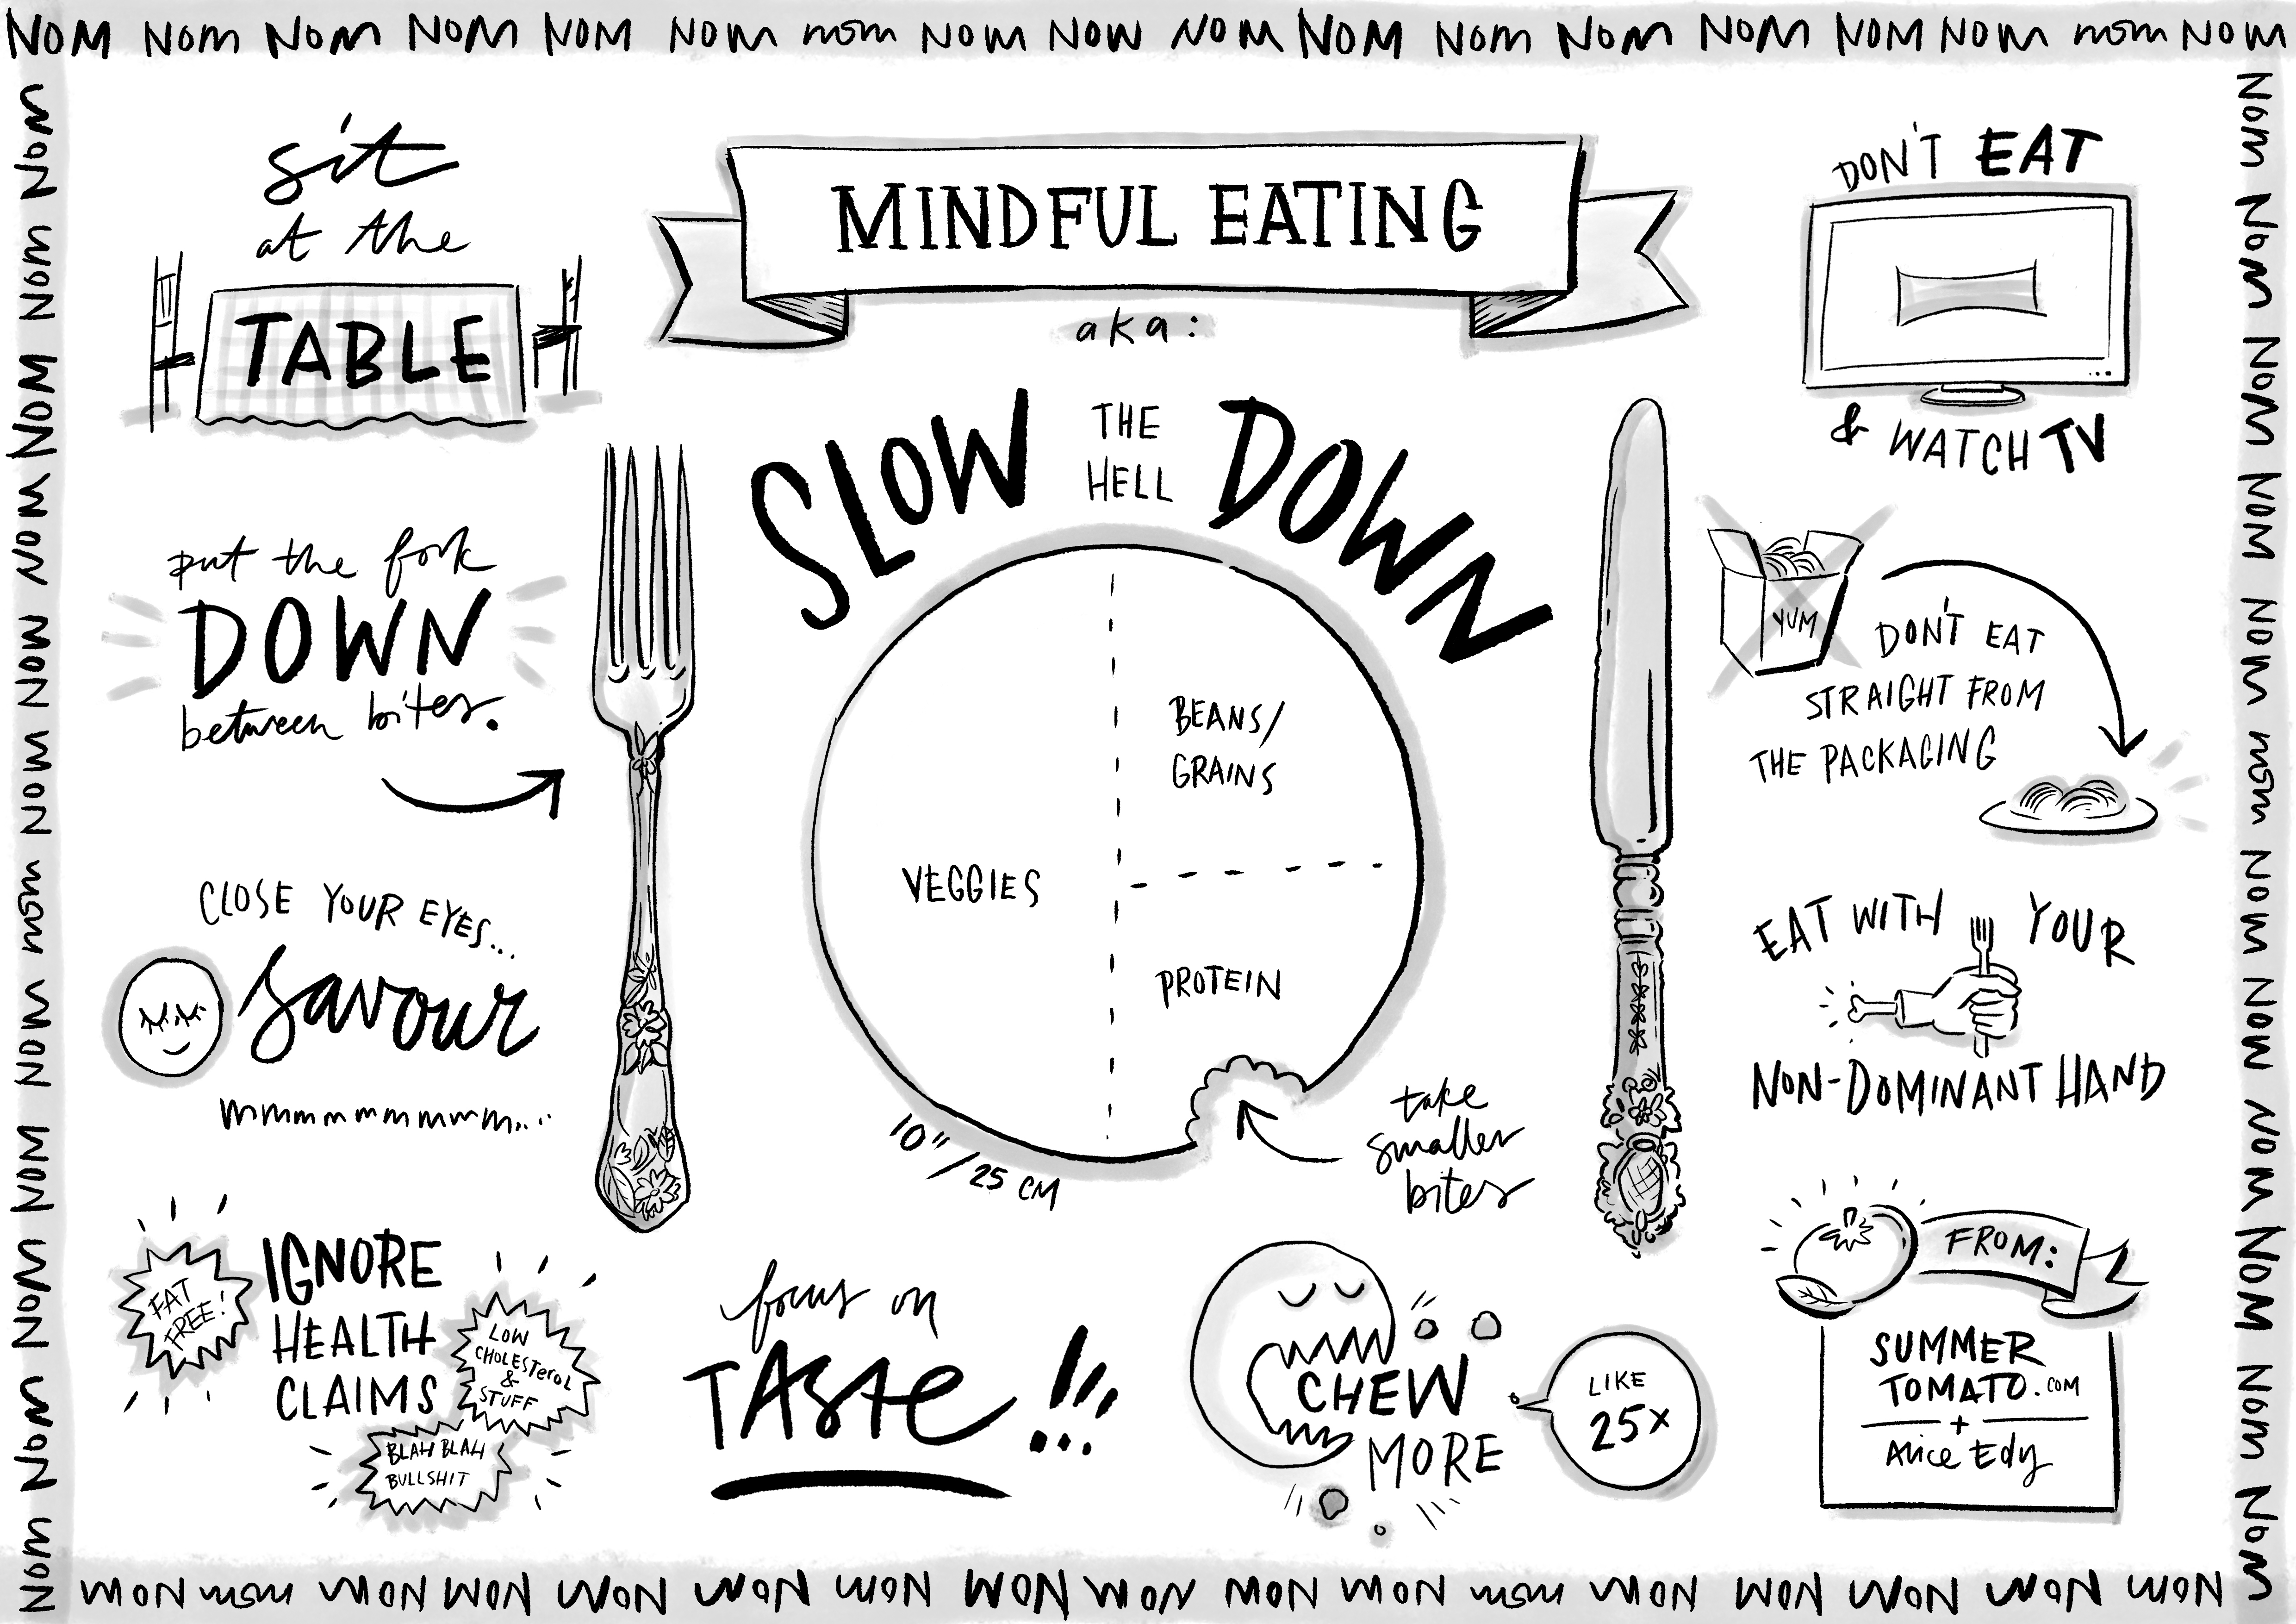 mindful eating | Summer Tomato